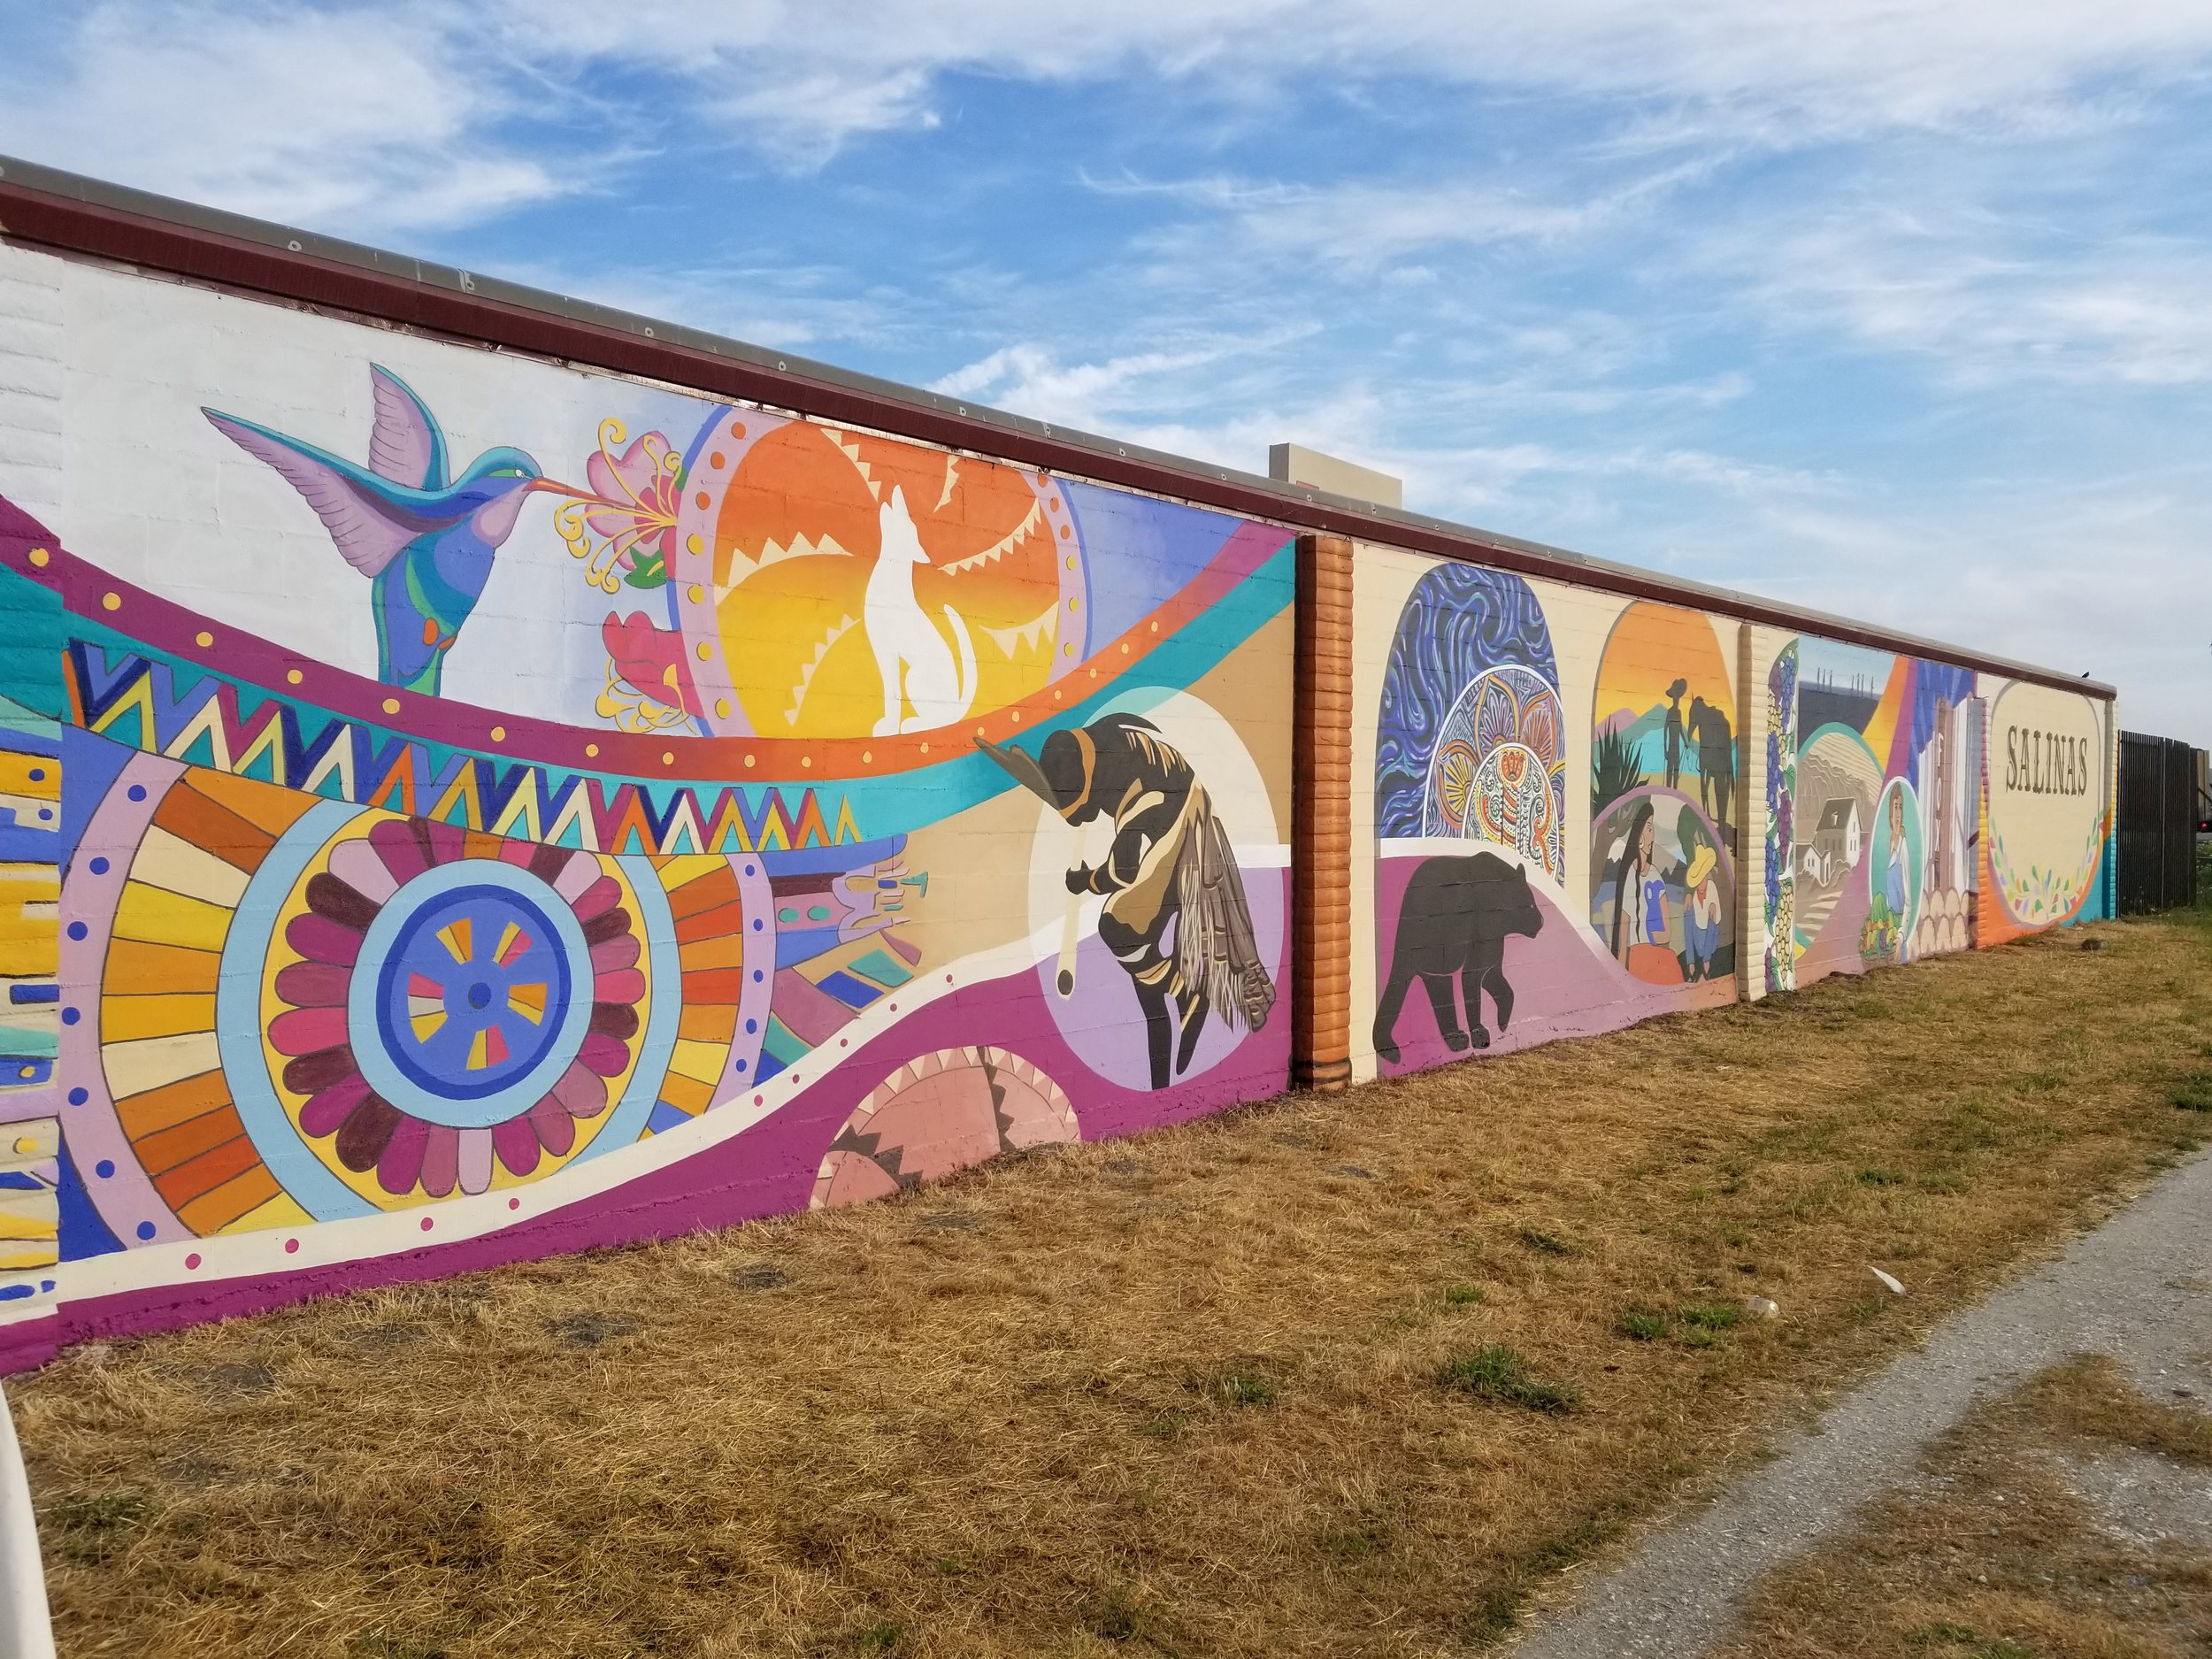 Detail of Salinas 600' mural